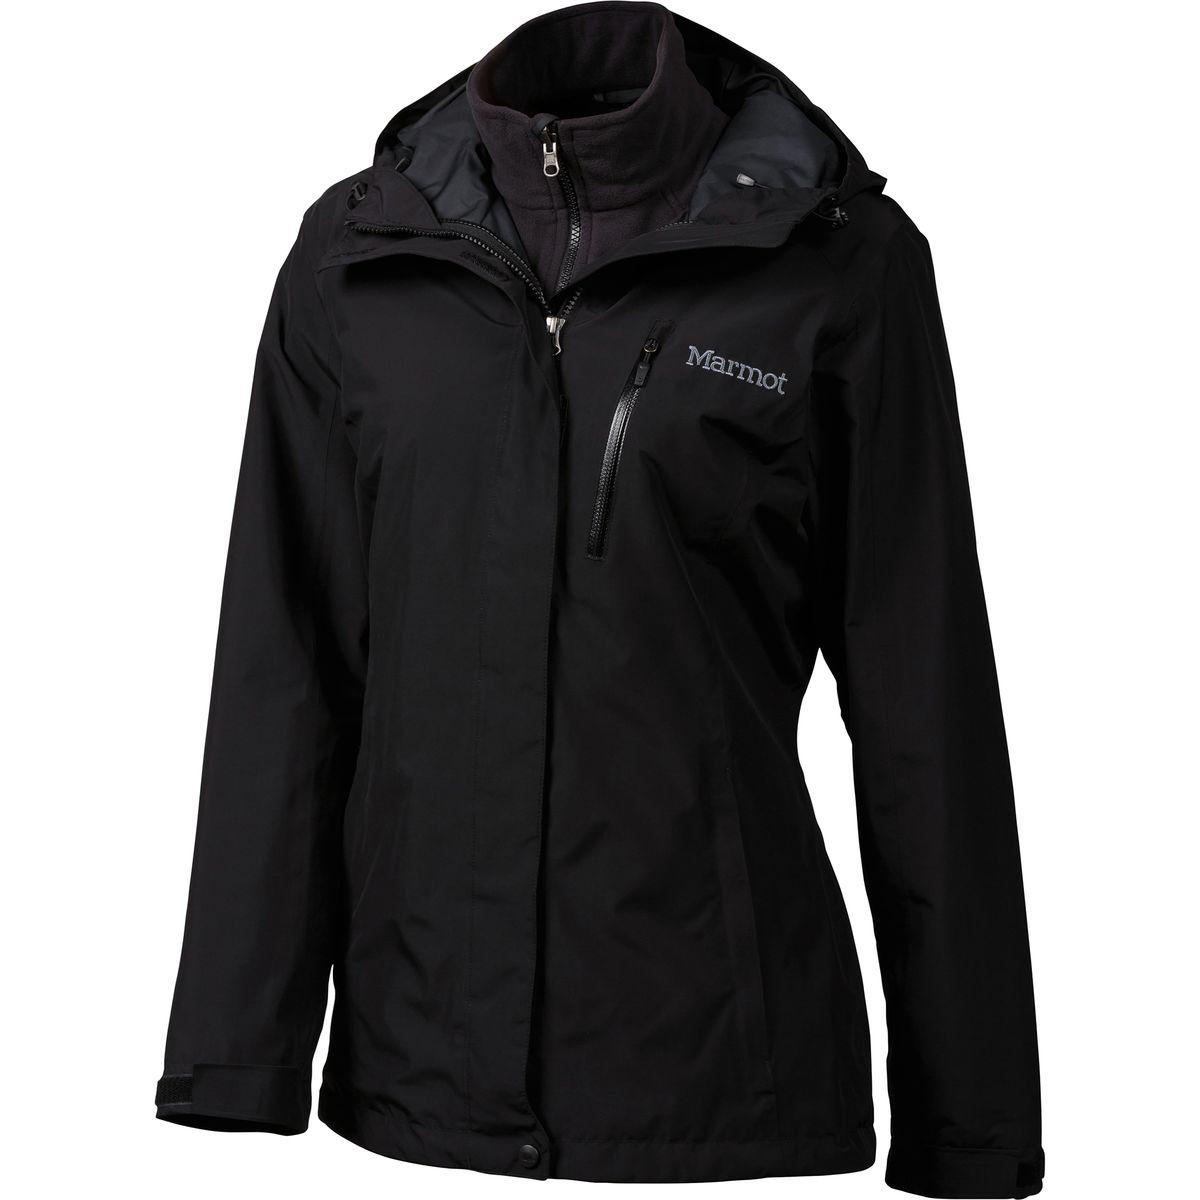 Marmot Ramble Component Jacket - Women